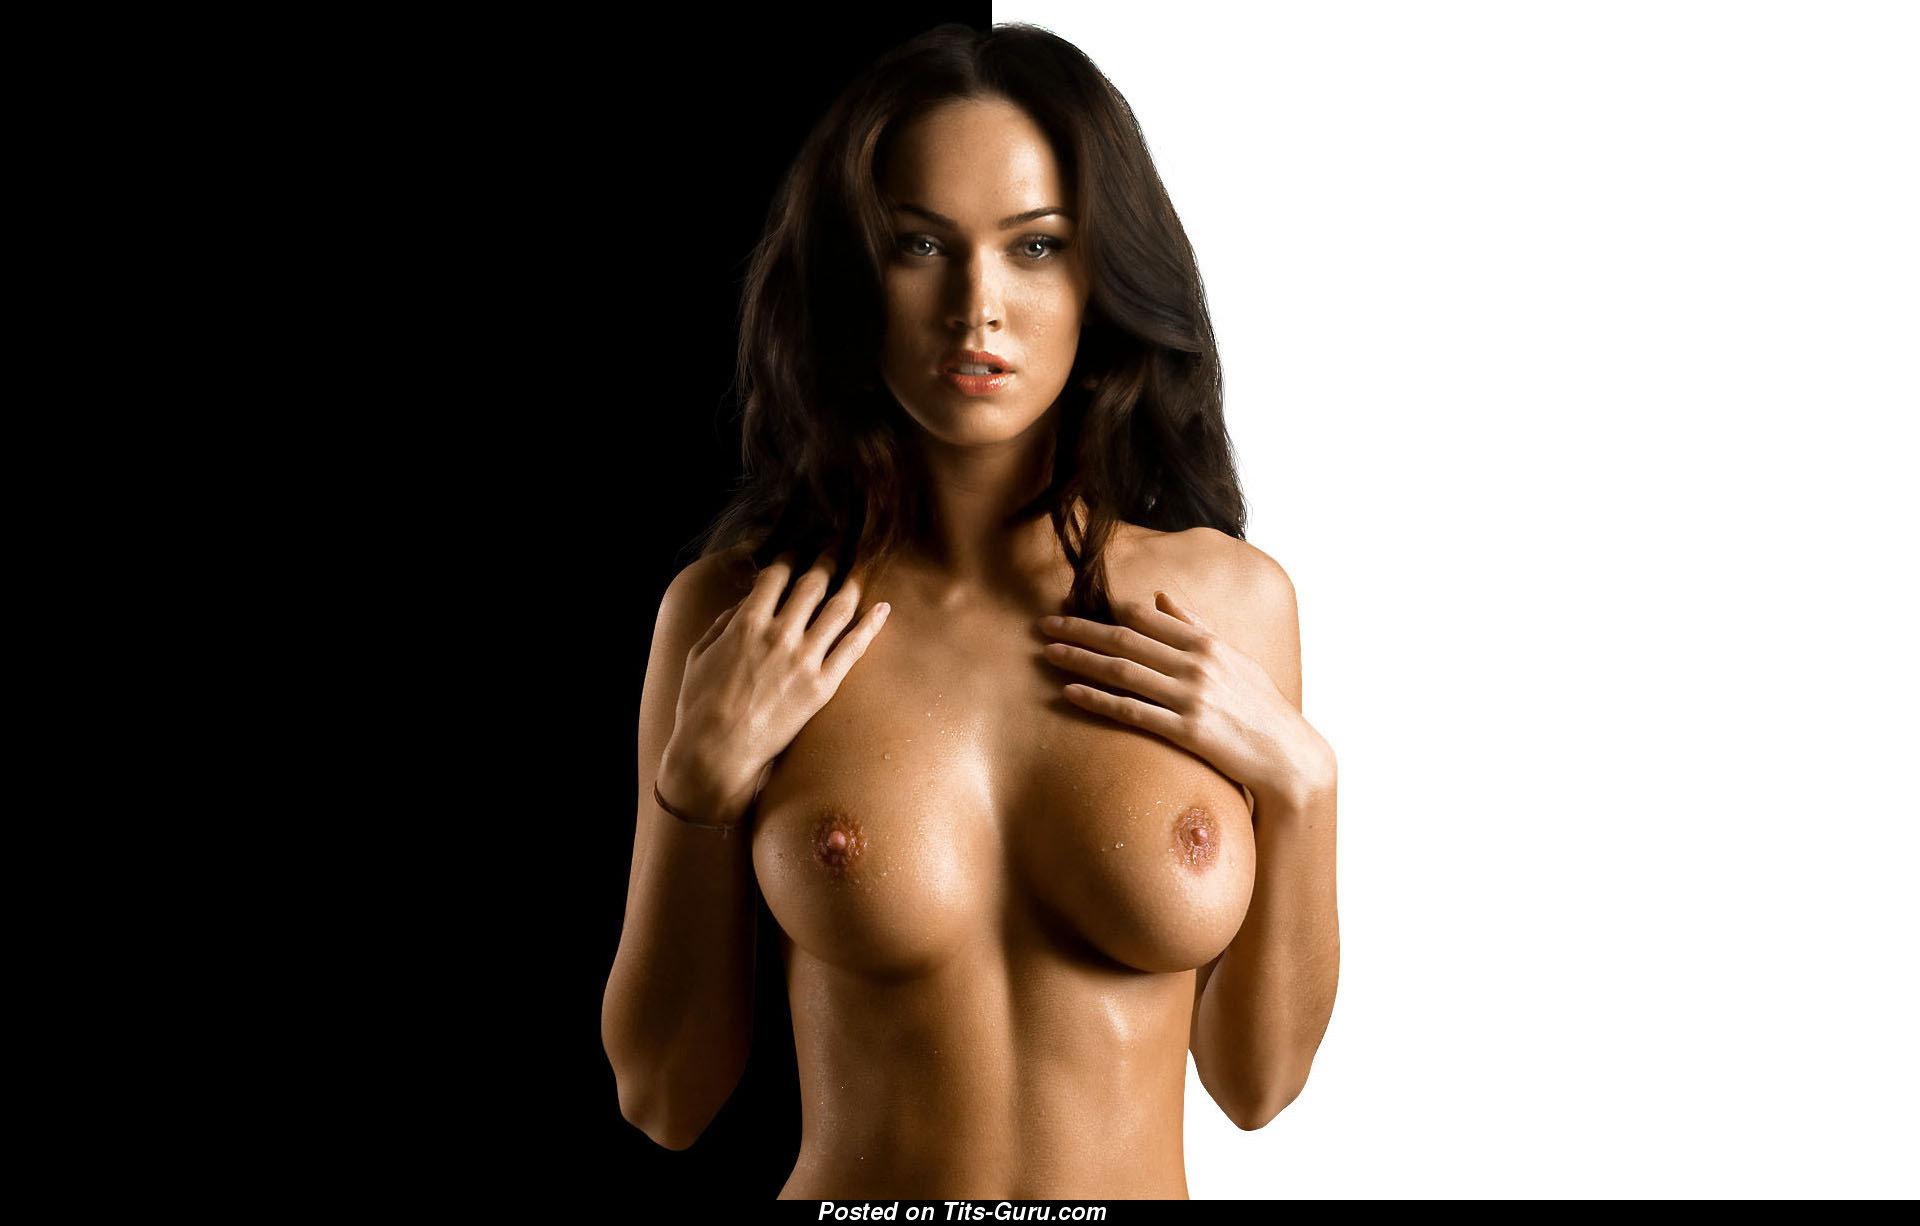 Megan Fox Nude Brunette With Medium Tittes Pic